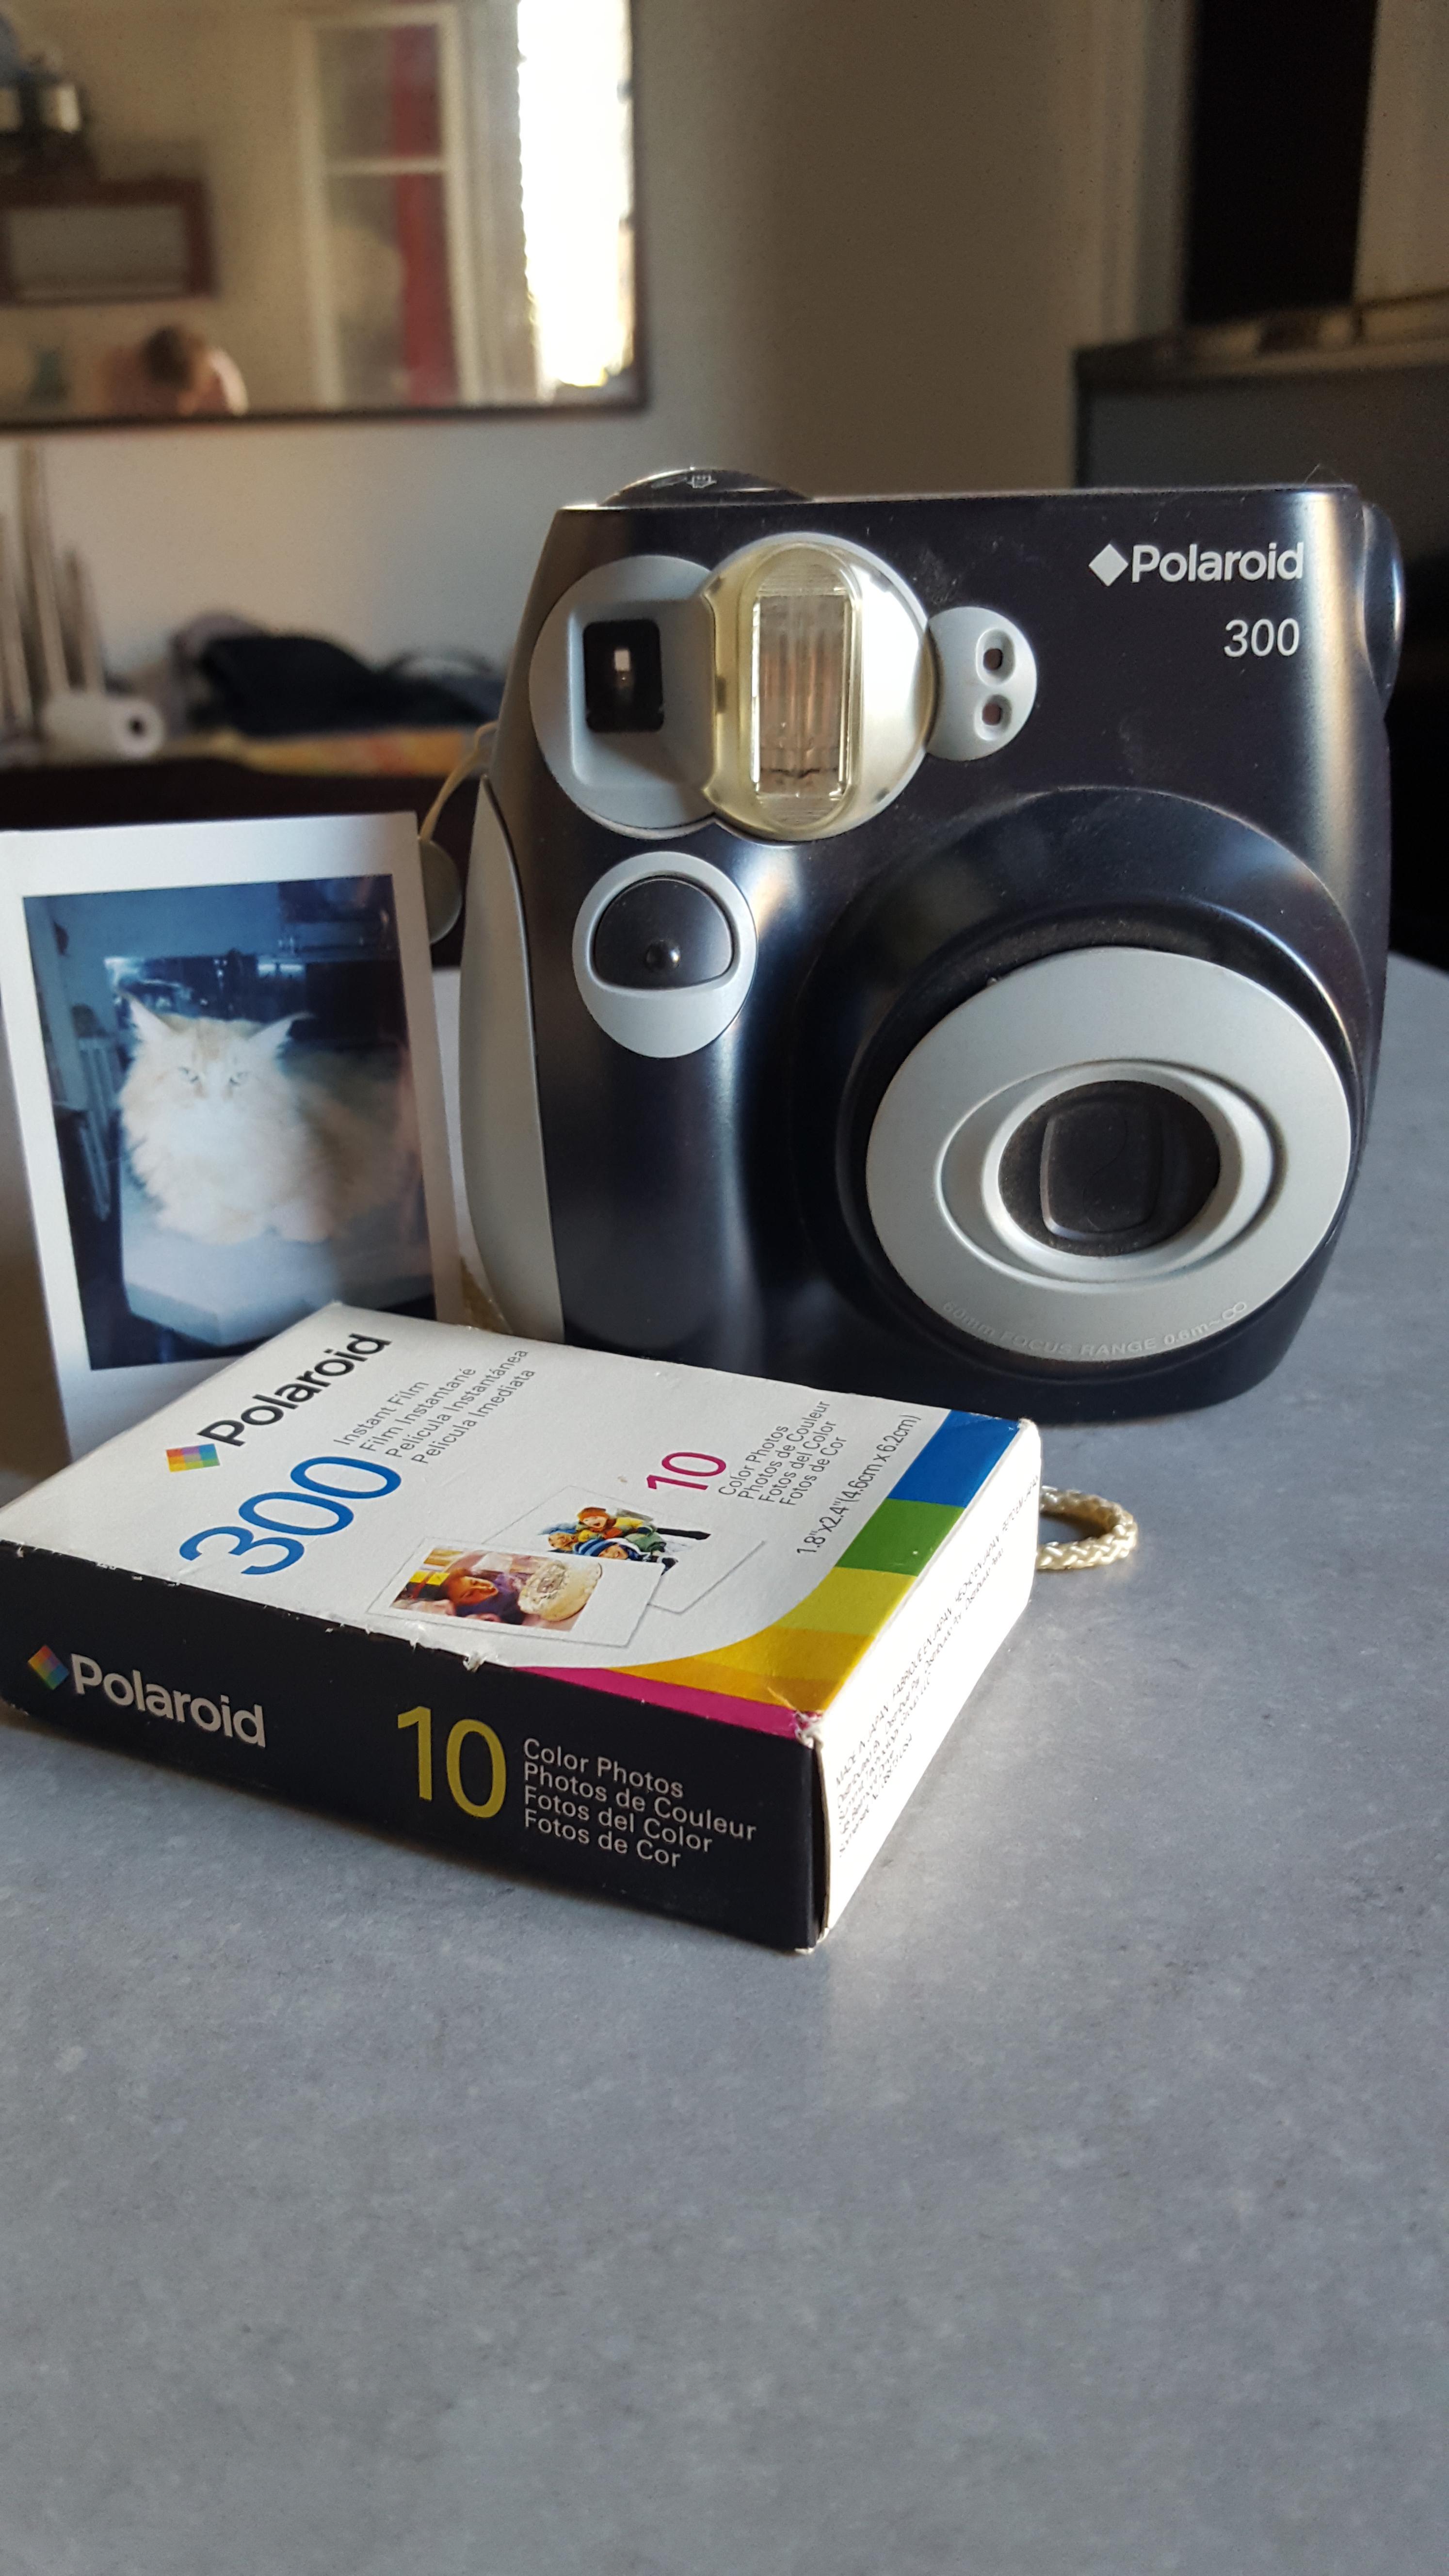 troc de troc polaroid pic 300 image 0